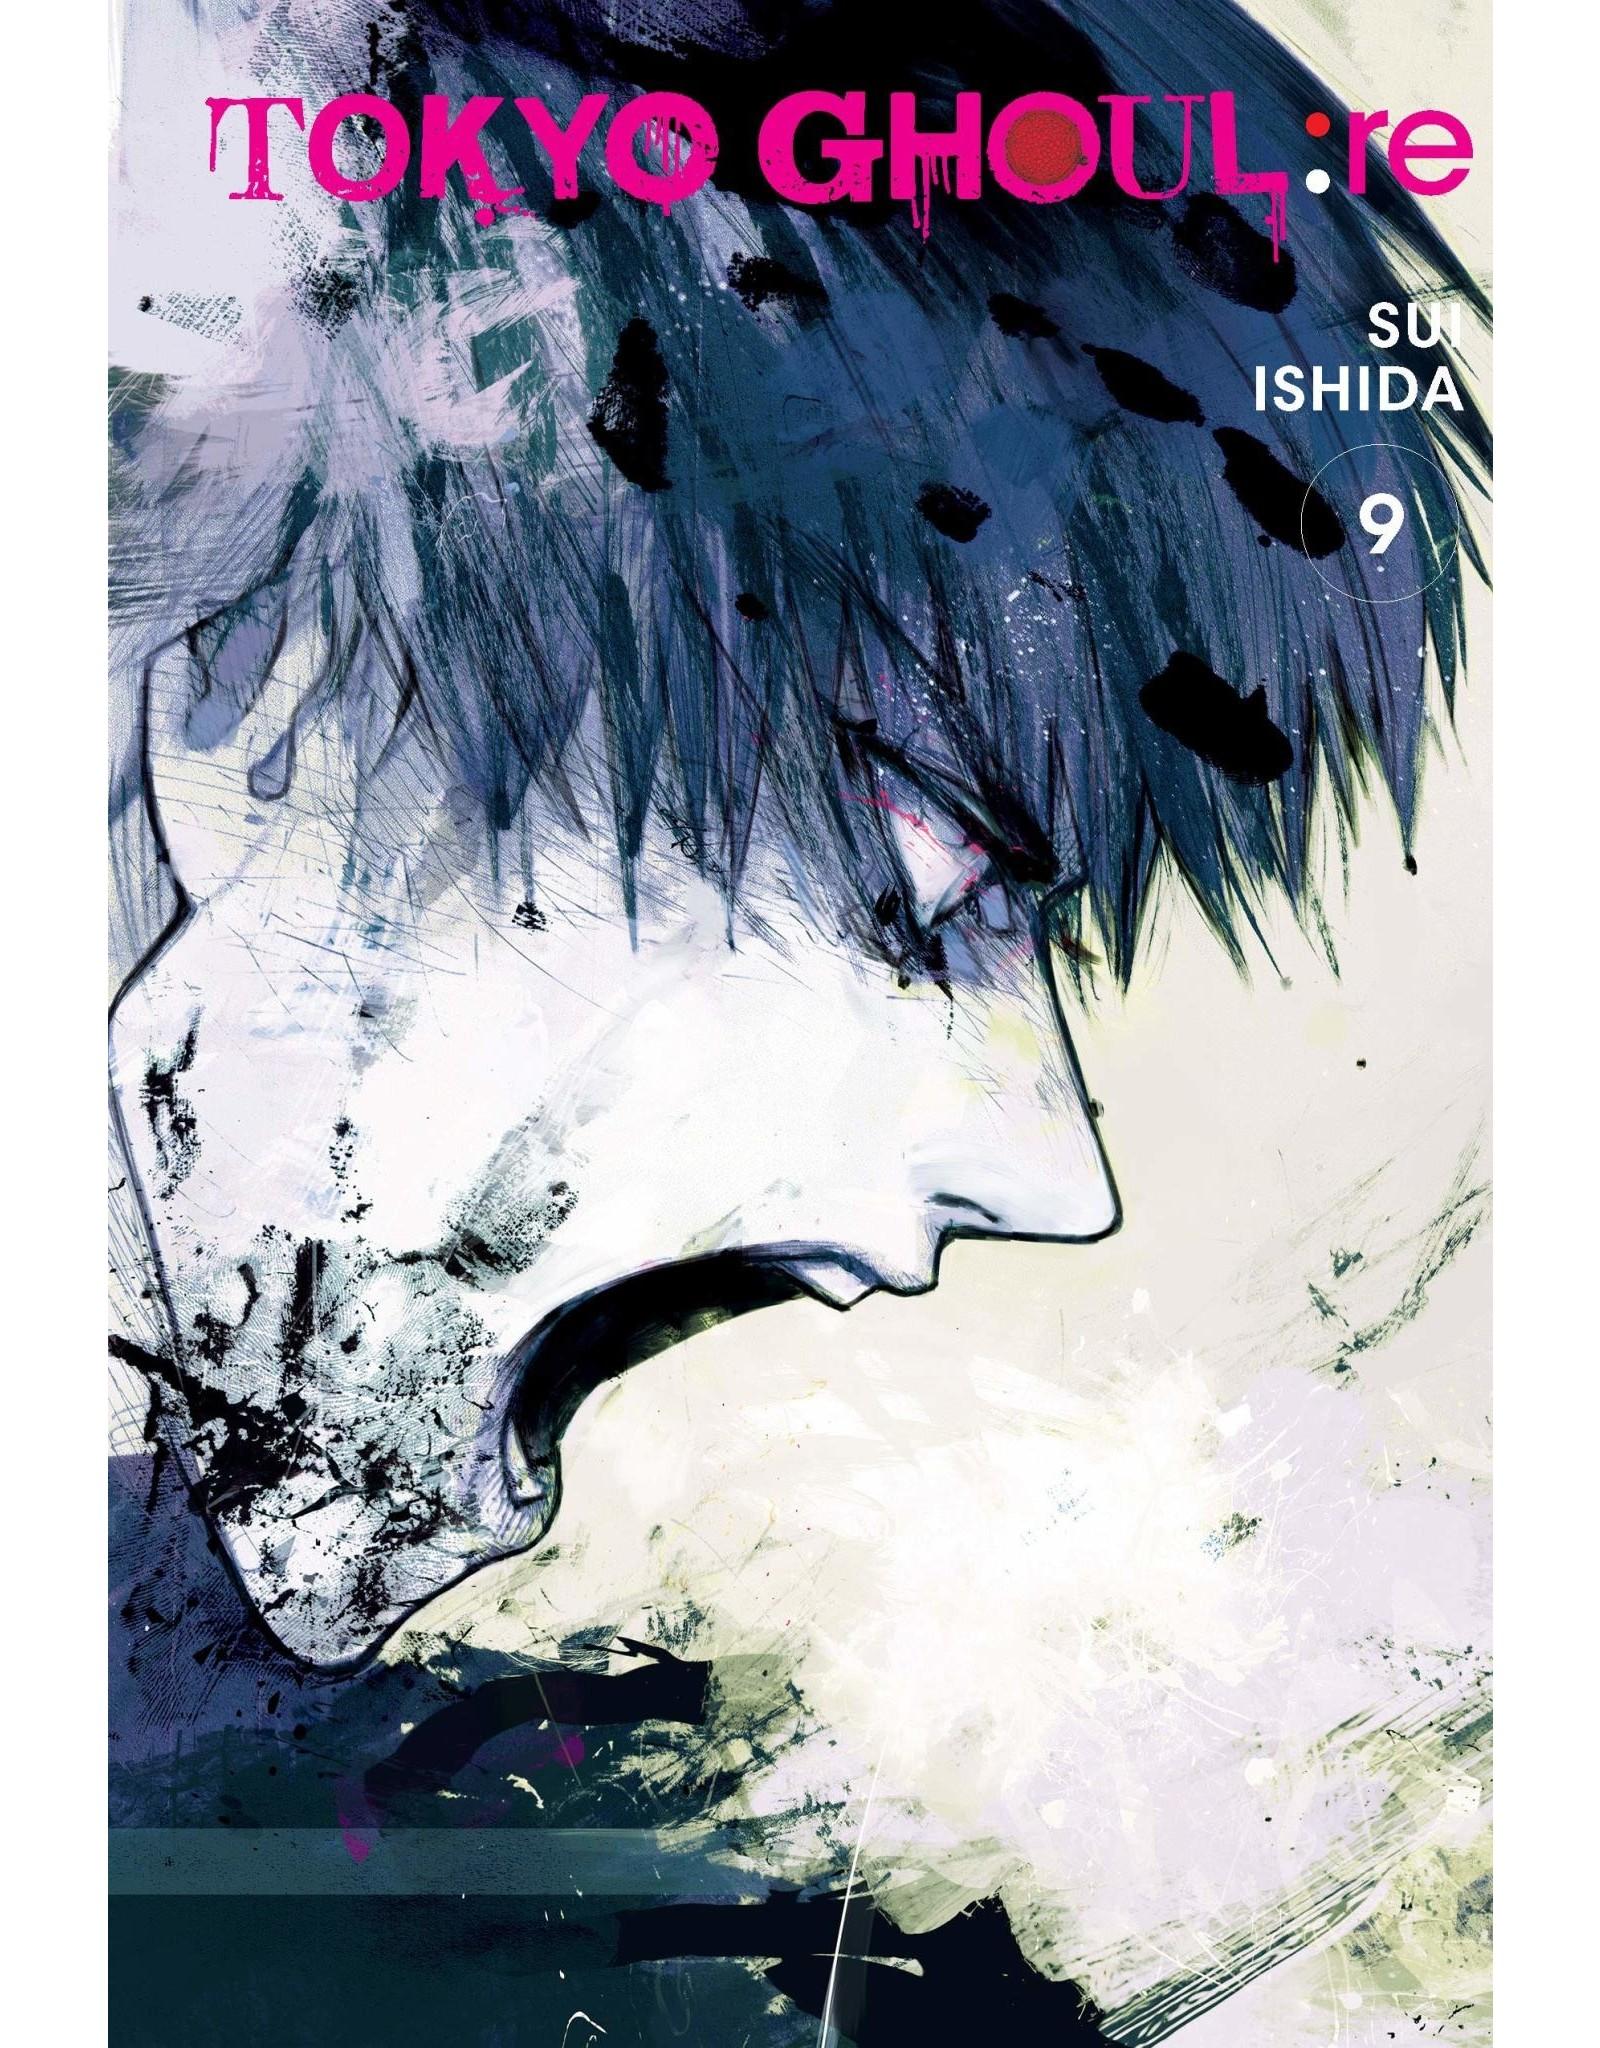 Tokyo Ghoul:re 09 (English Version)